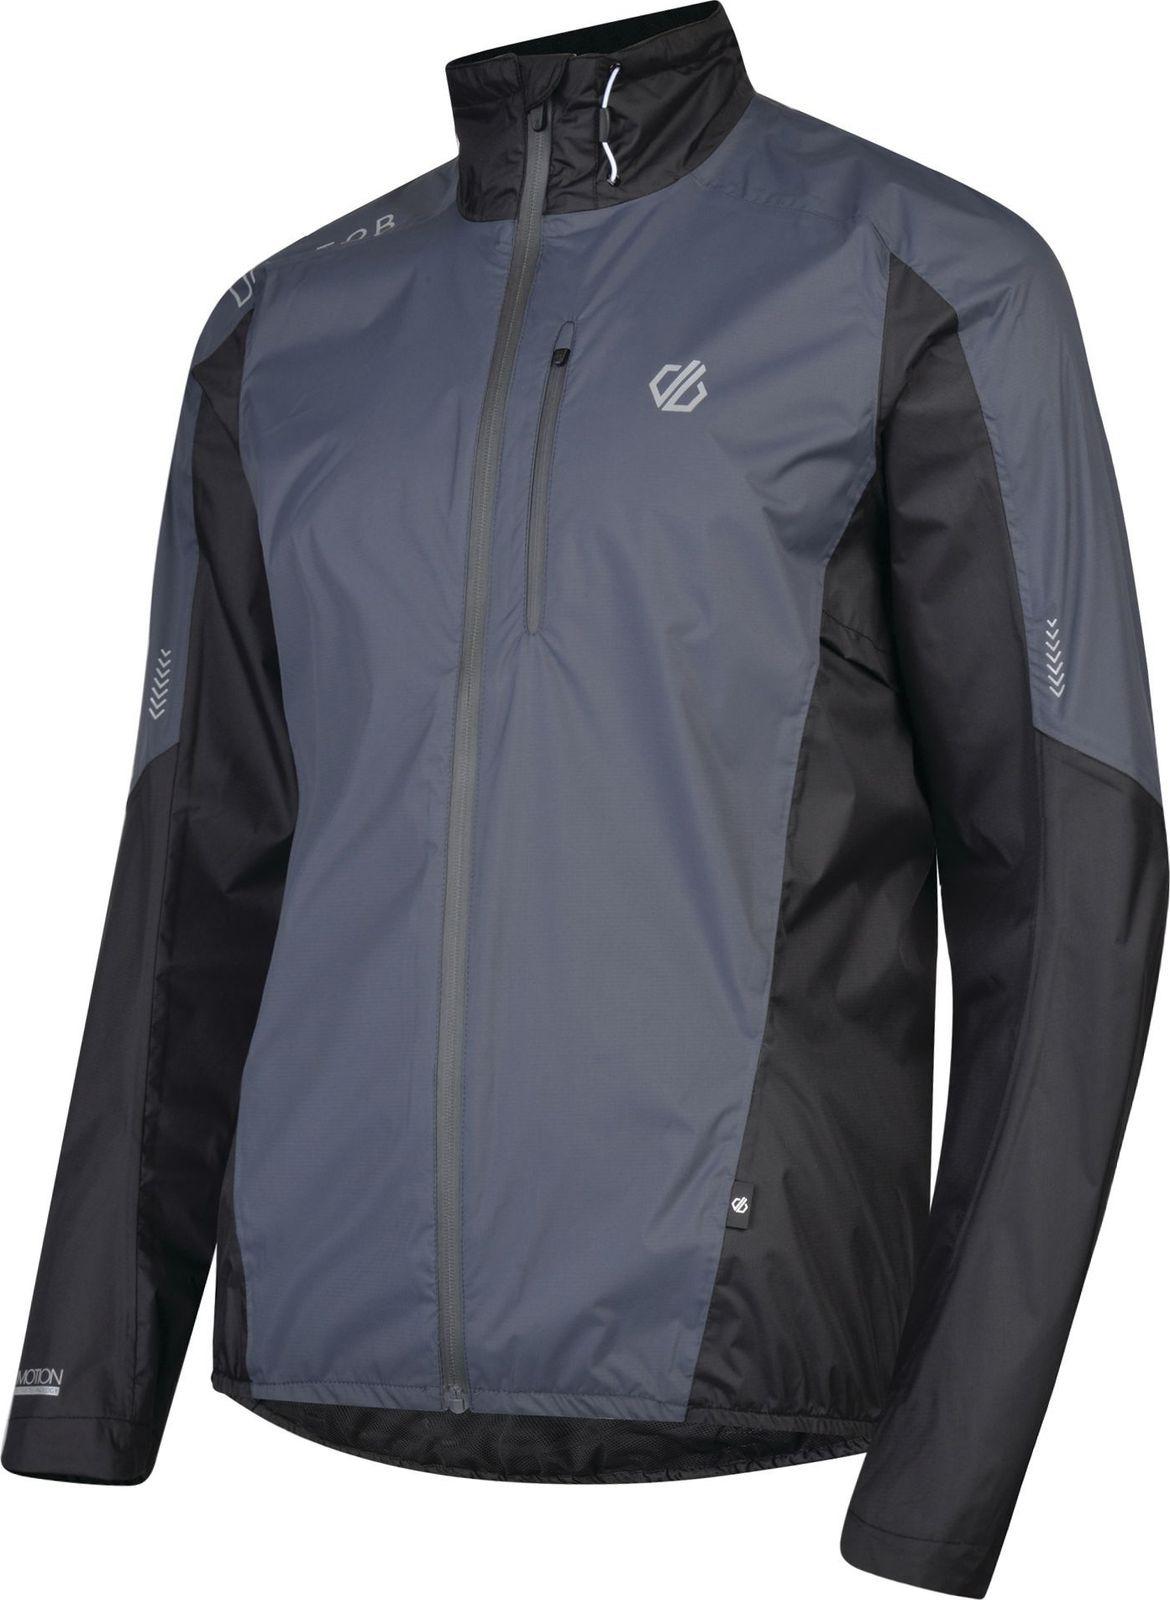 Велокуртка мужская Dare 2b Mediant Jacket, цвет: серый. DMW456-9QV. Размер 3XL (62)